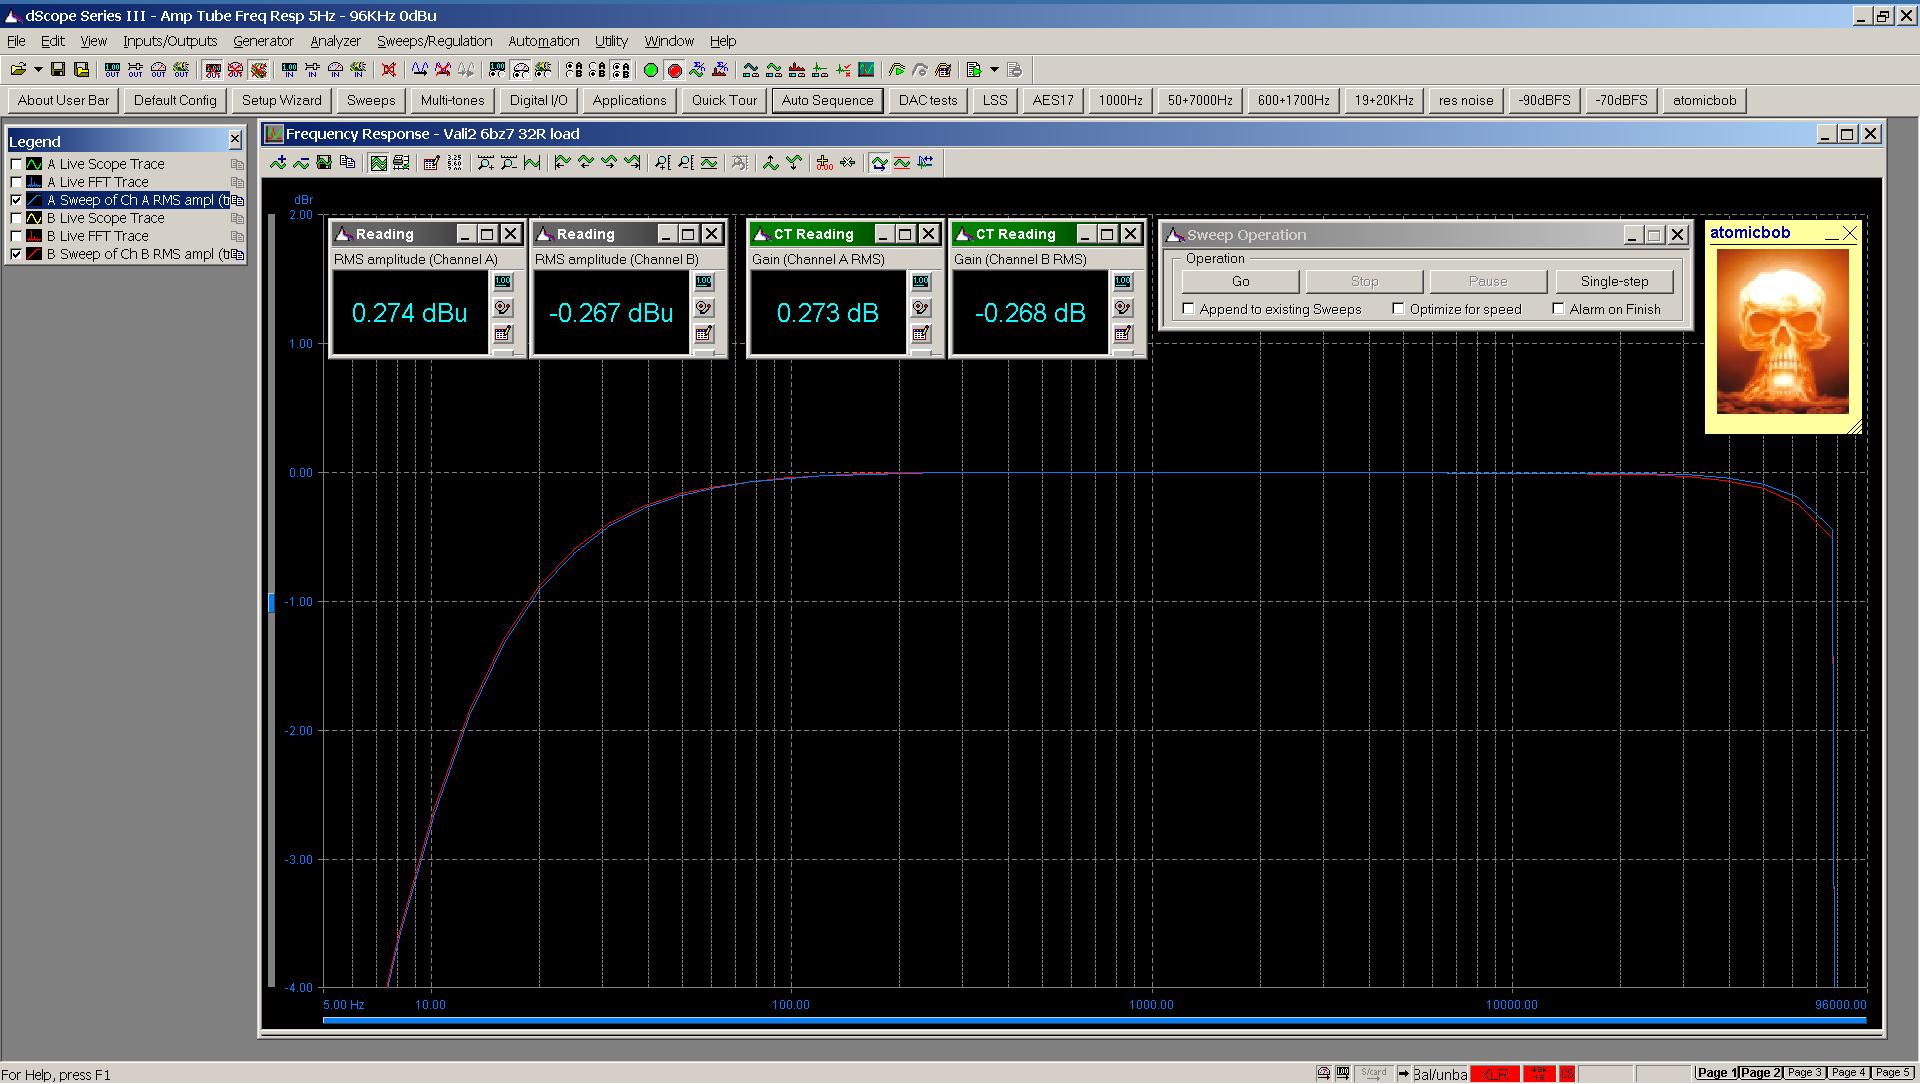 20201125 Vali2 6bz7 frequency response 5Hz - 96KHz 32R 0dBu.png